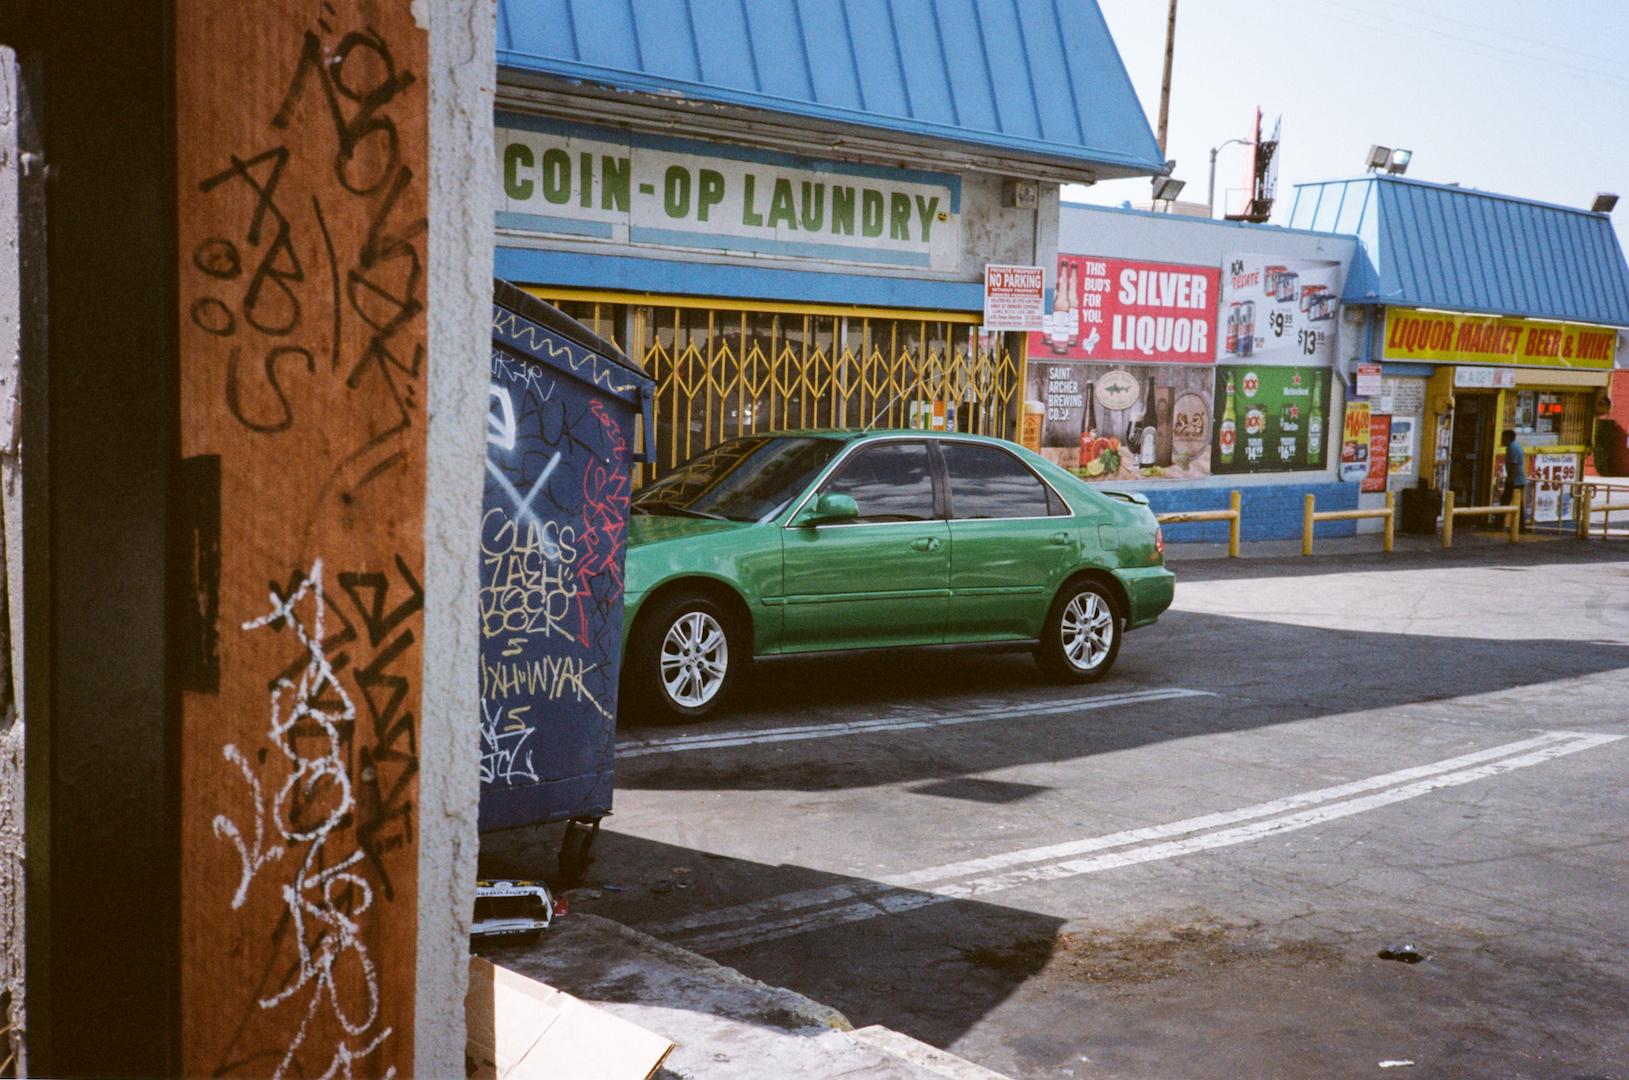 Benton Way, Kodak Portra 160VC